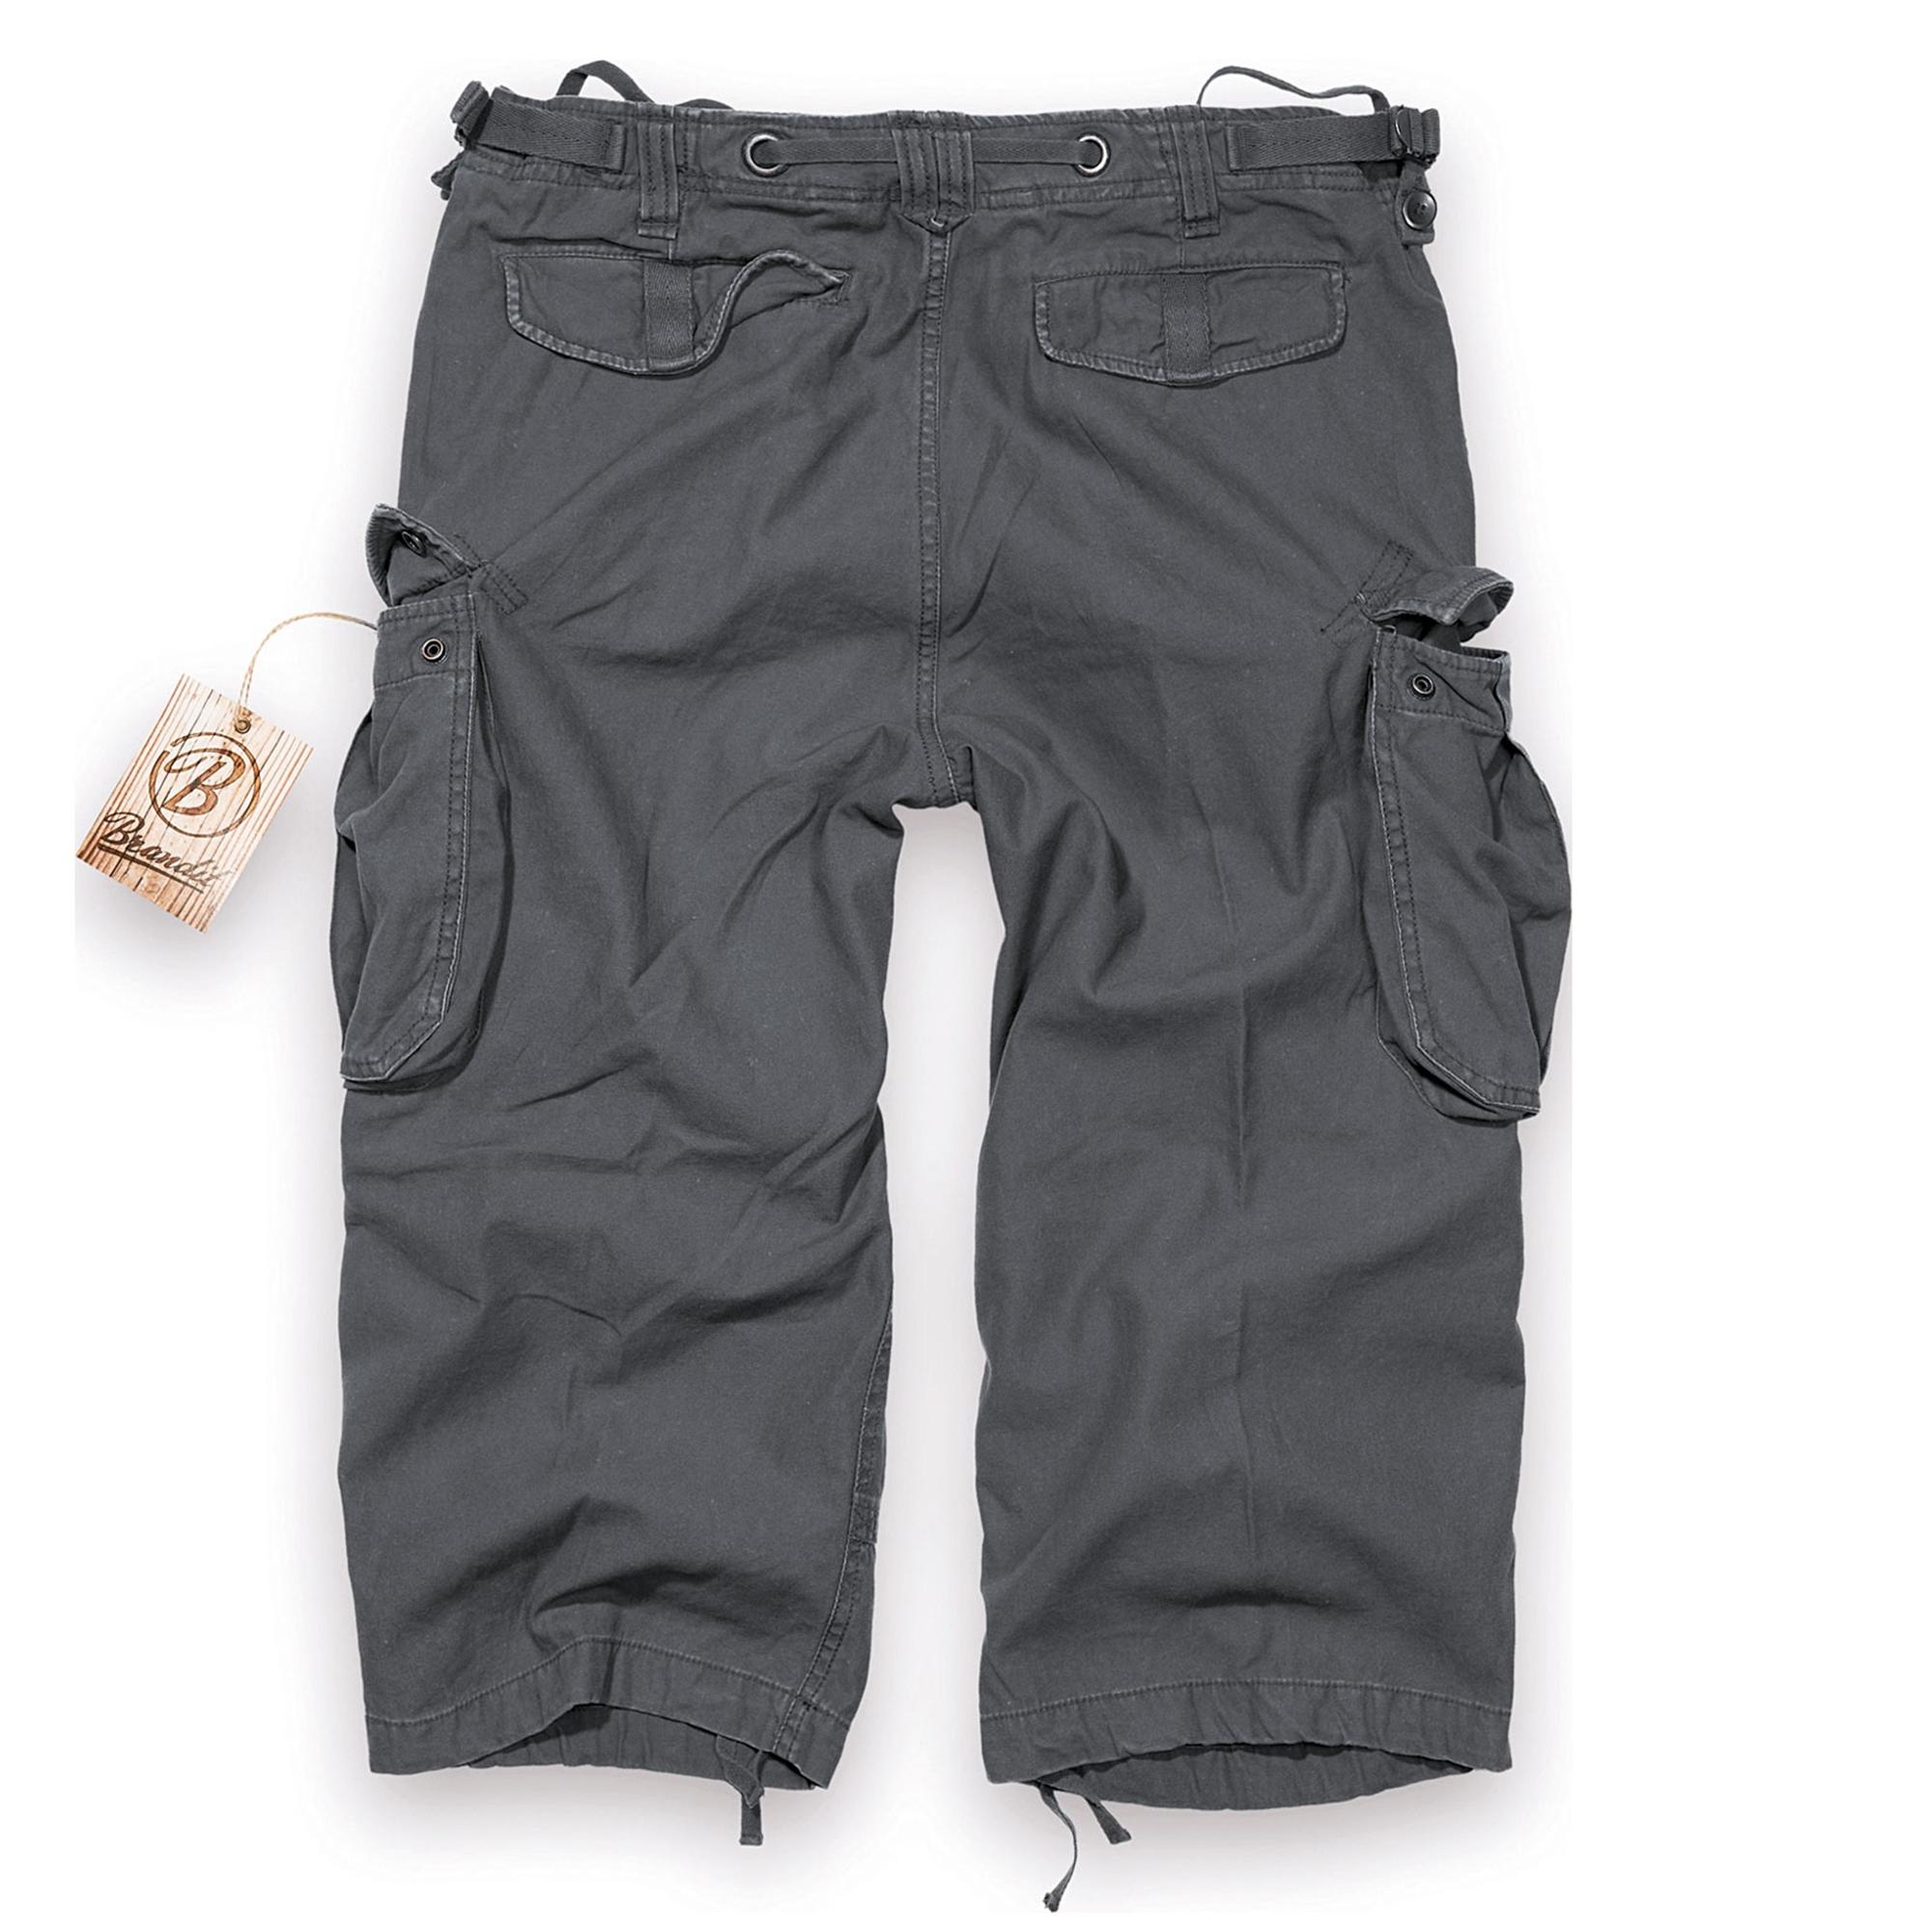 Brandit-Industry-3-4-Herren-Cargo-Shorts-Bermuda-Kurze-Hose-Short-US-Army-Ranger Indexbild 8